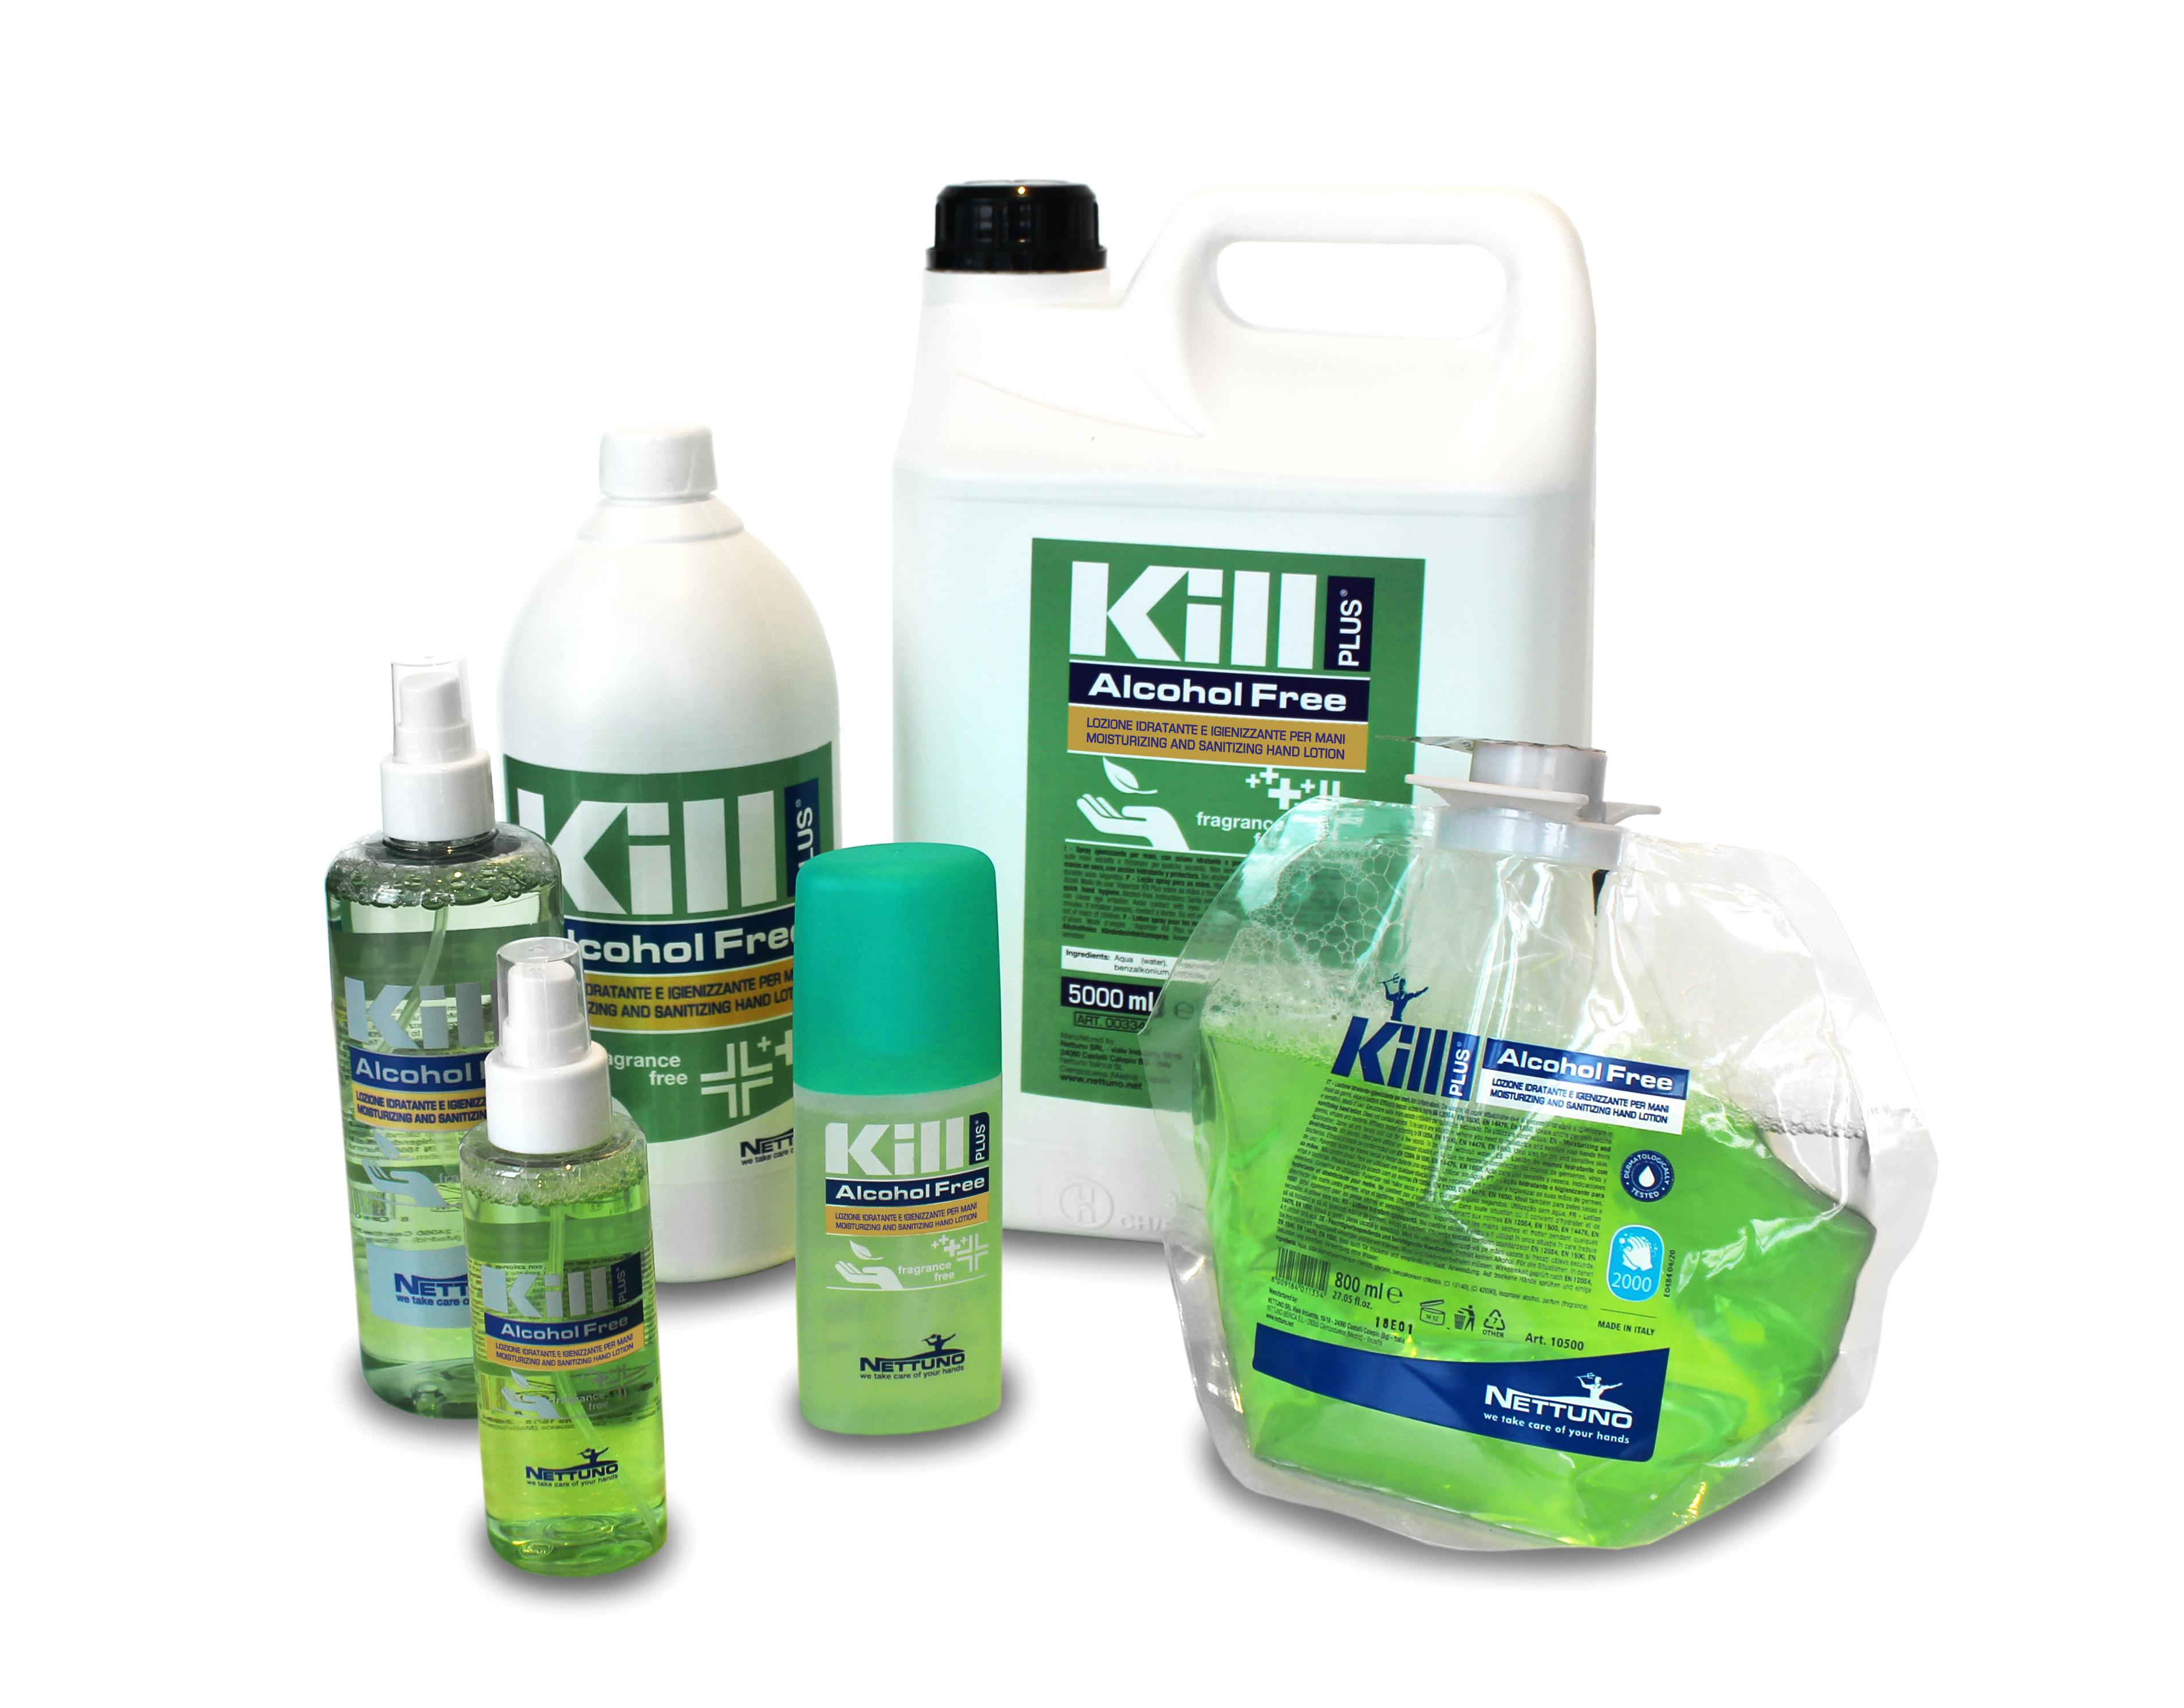 produttore gel igienizzante mani